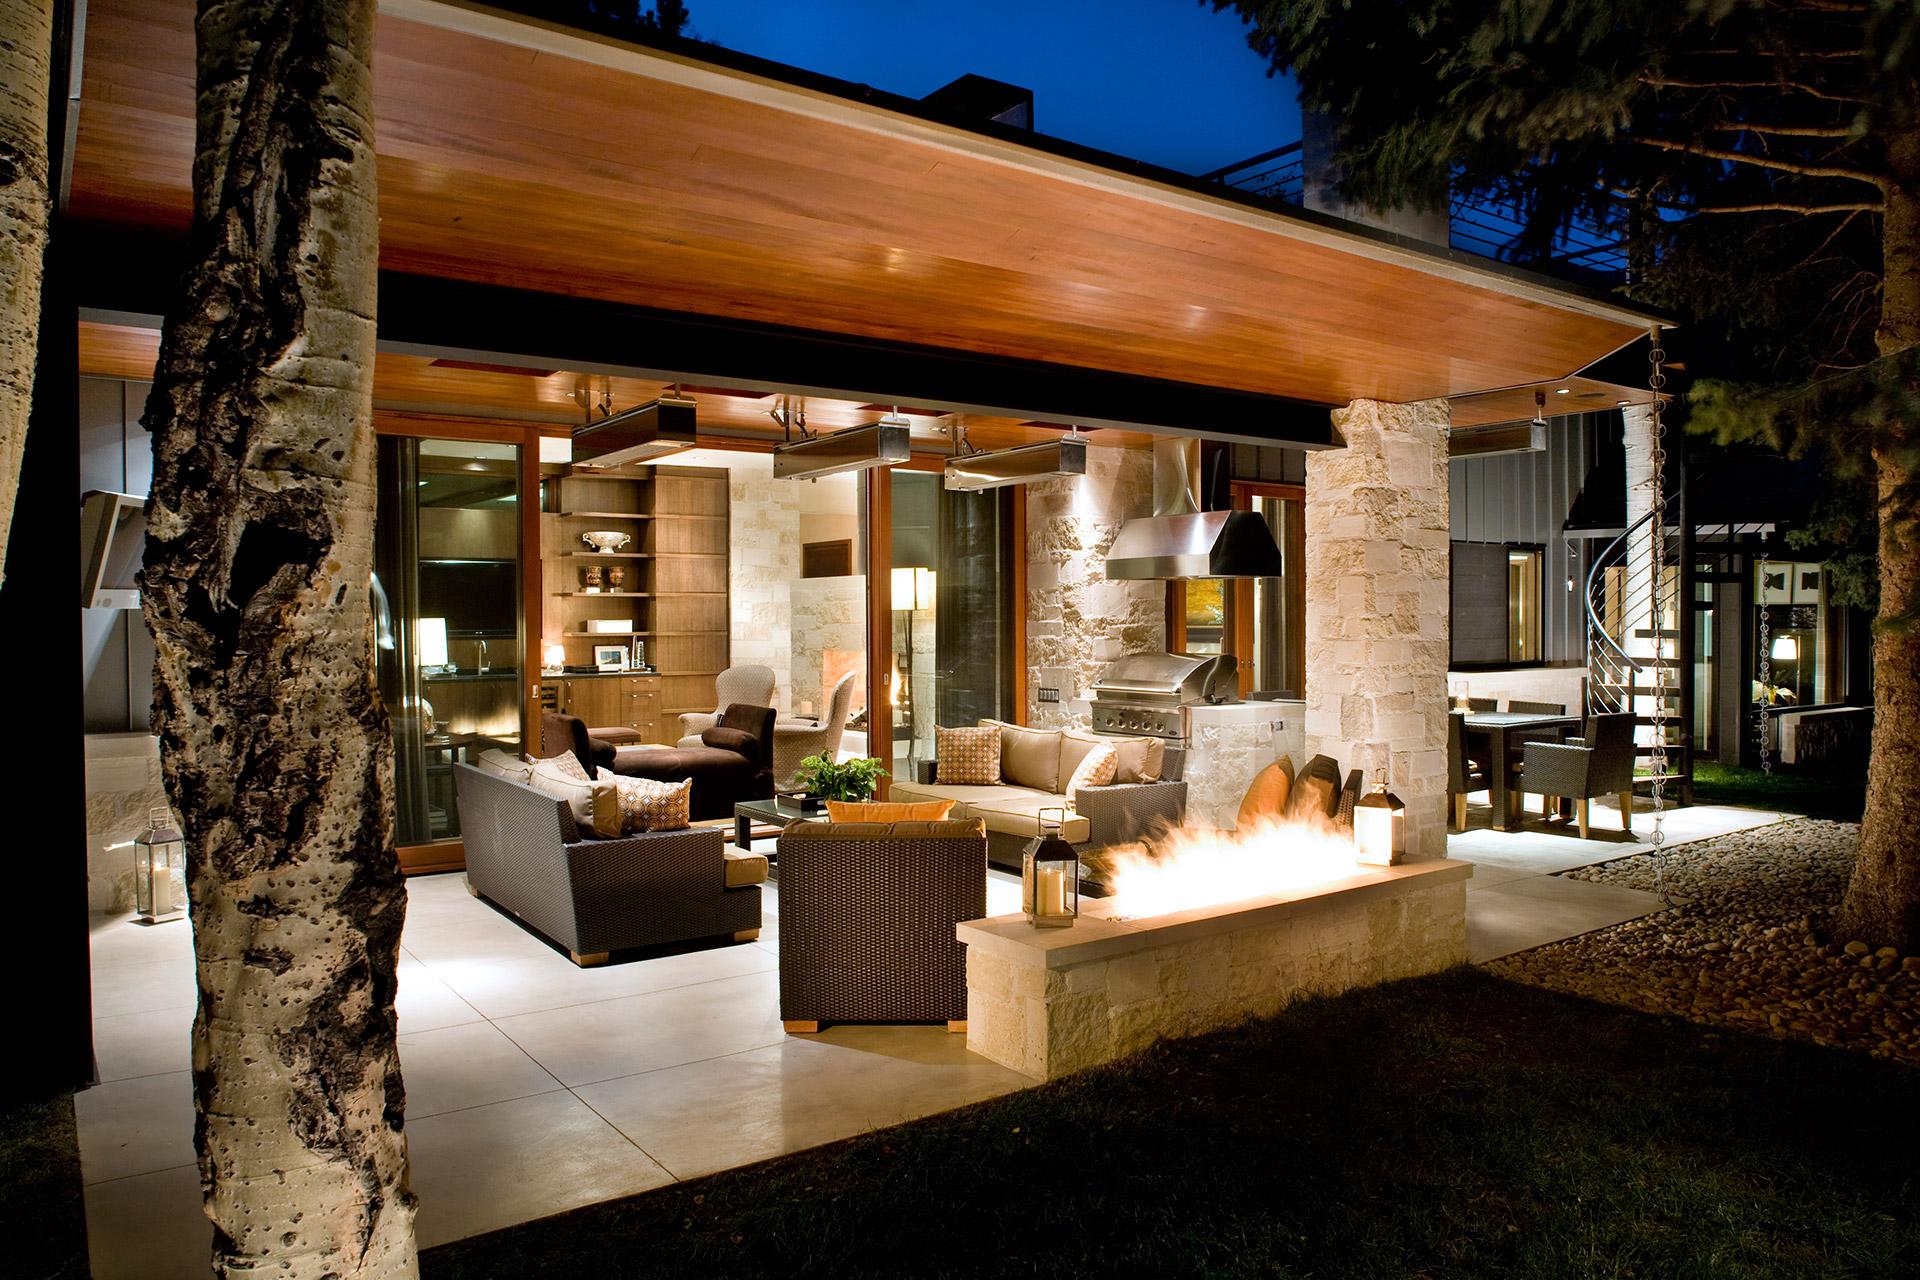 ranch house renovation ideas